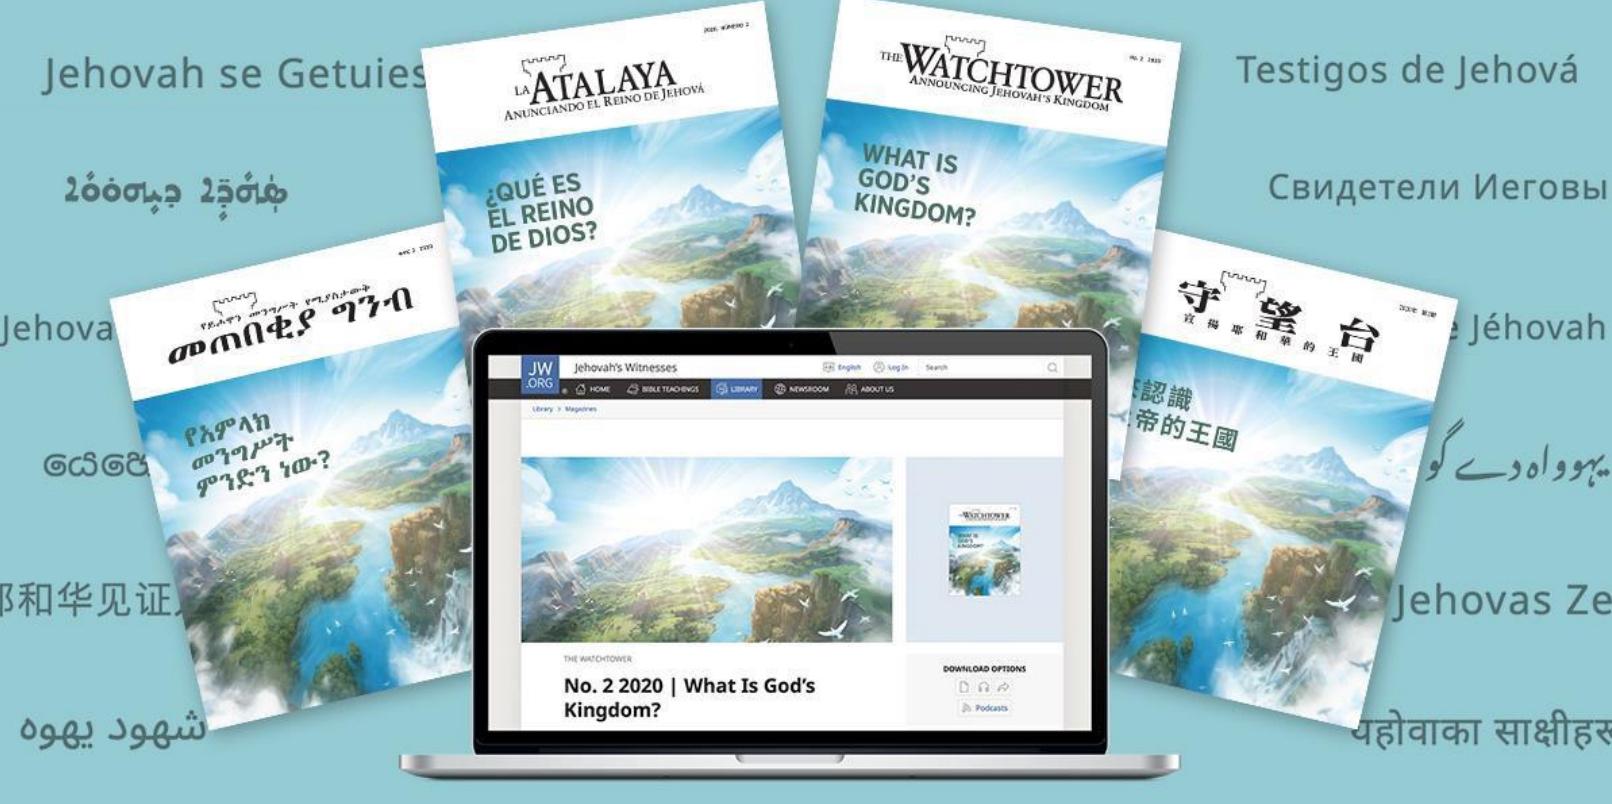 Jehovah betting lines oberbettingen motorrad stemler